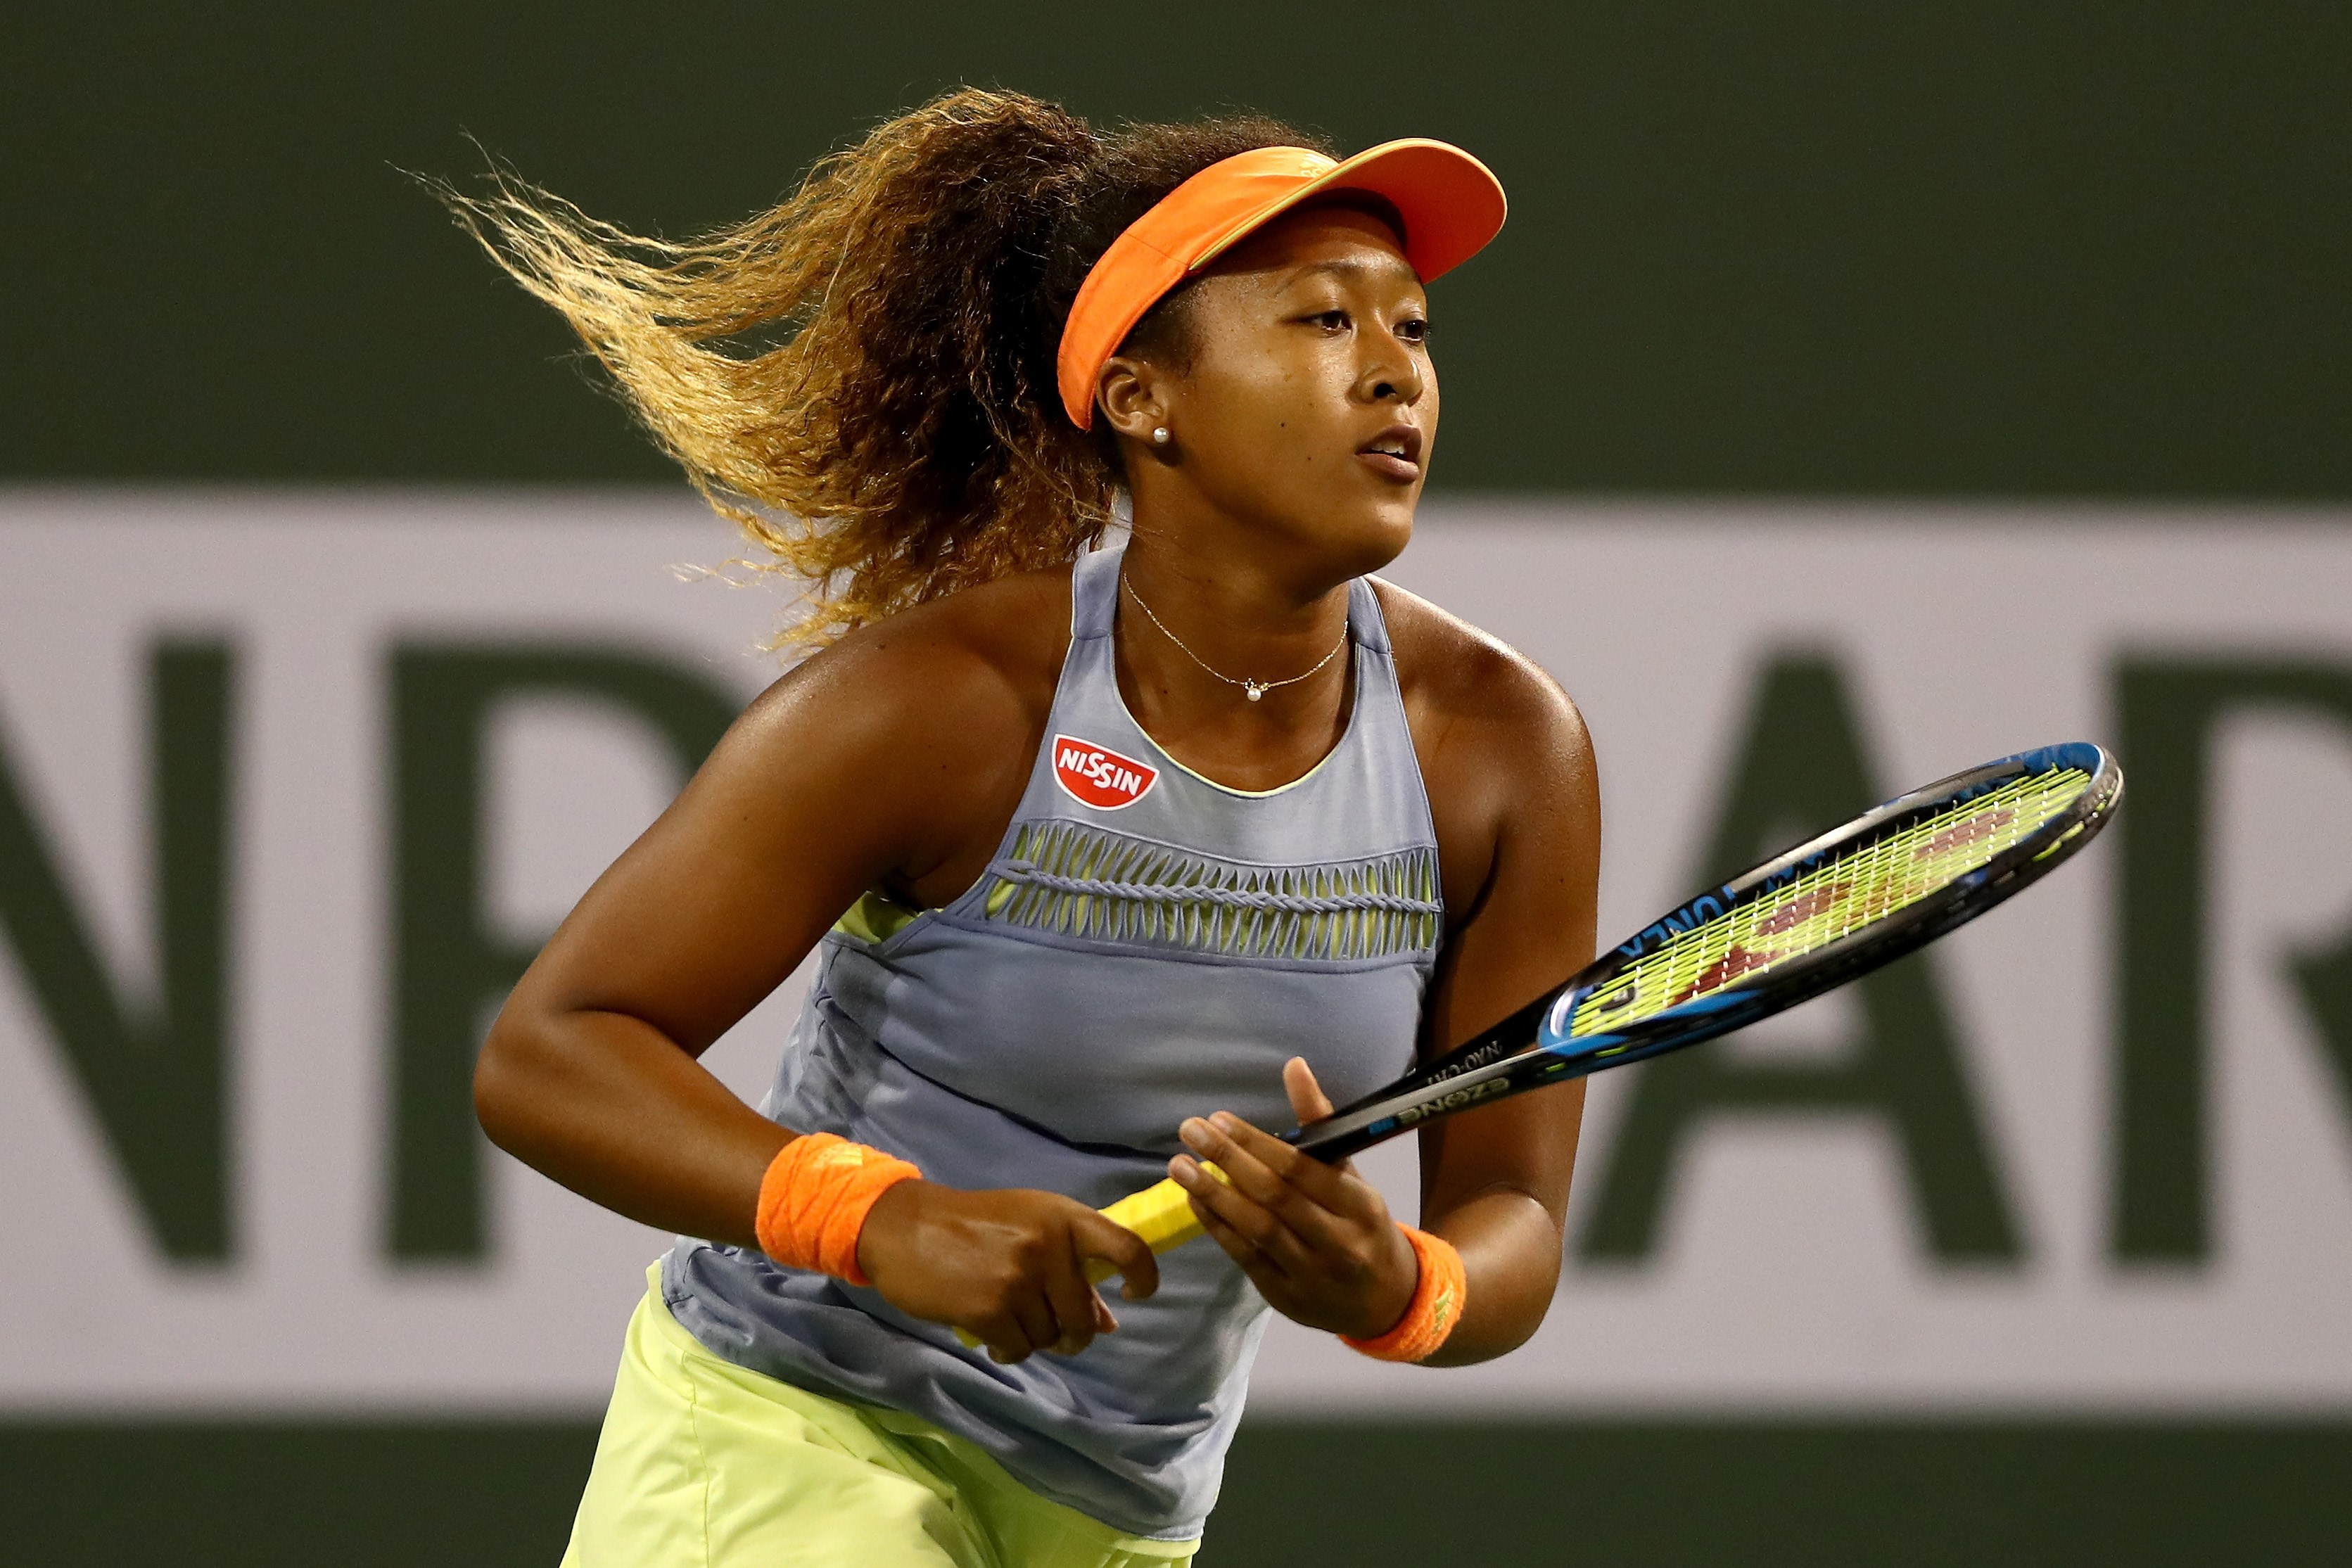 Tennis - WTA - Indian Wells : Osaka-Kasatkina, finale de l'insolente jeunesse